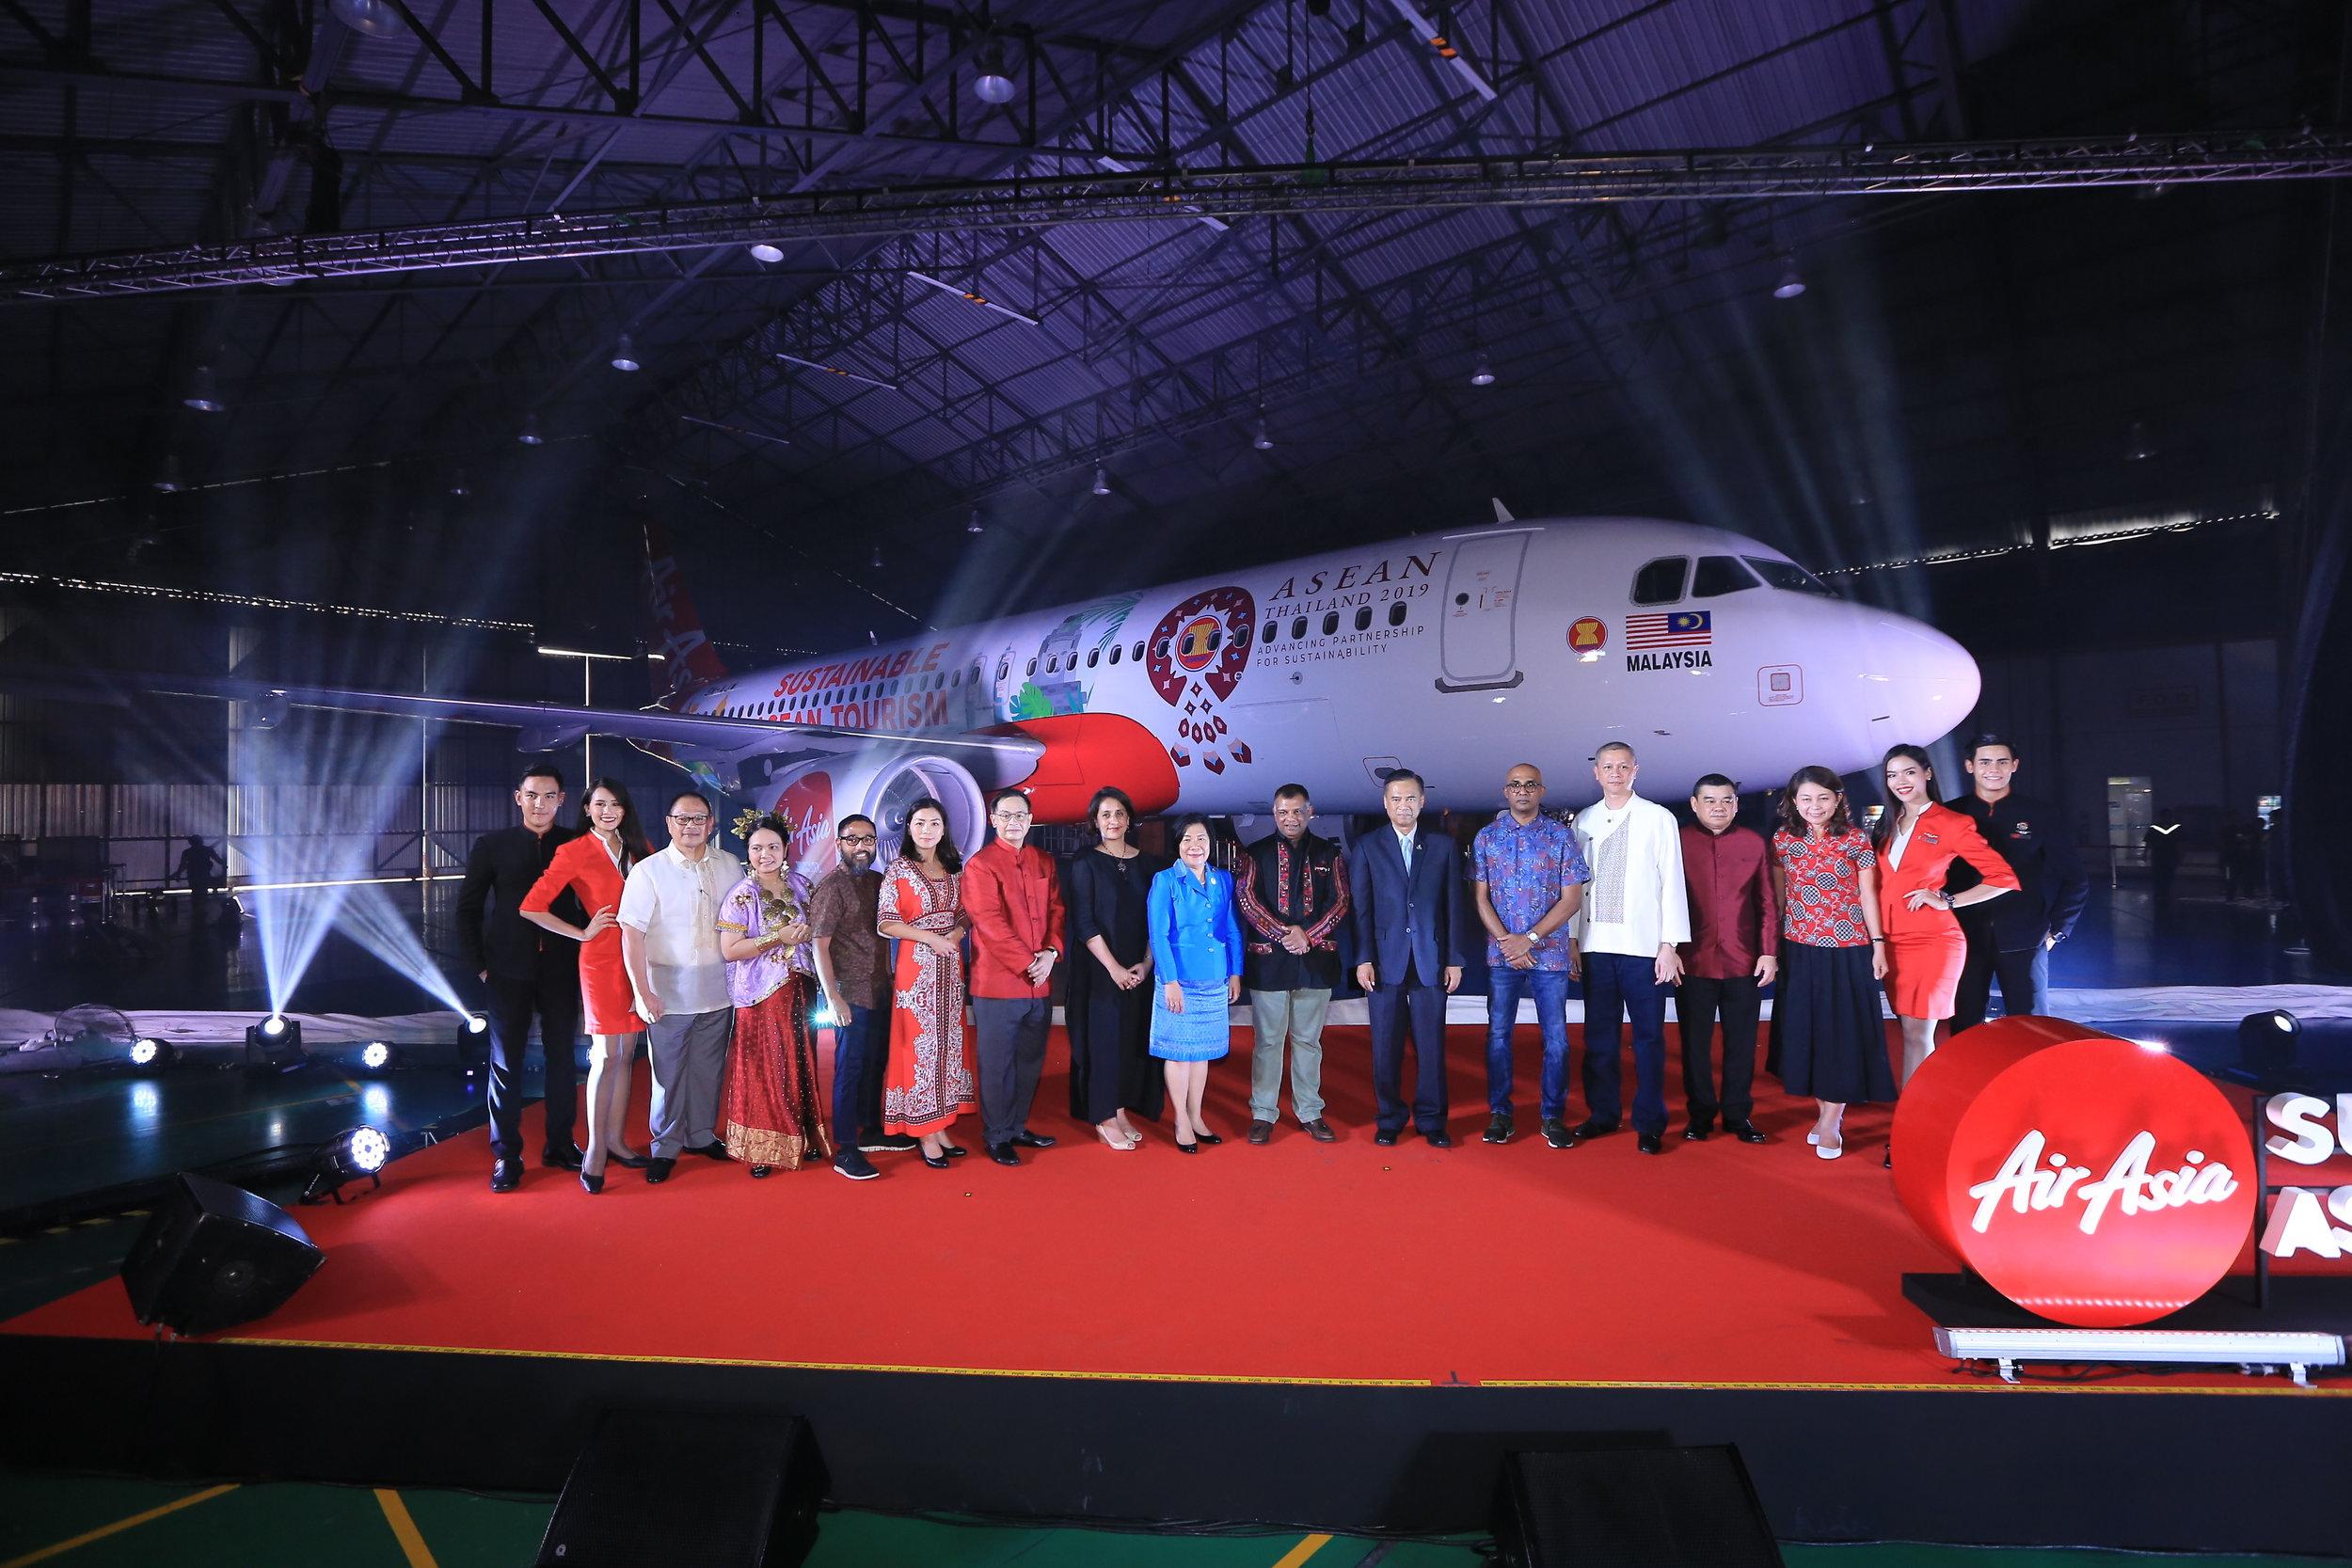 CEO AirAsia Group Tony Fernandes (tengah) bersama pejabat Kementerian Luar Negeri Thailand beserta jajaran manajemen AirAsia dari berbagai negara berfoto bersama di depan pesawat Airbus A320 AirAsia bertema 'Sustainable ASEAN'.